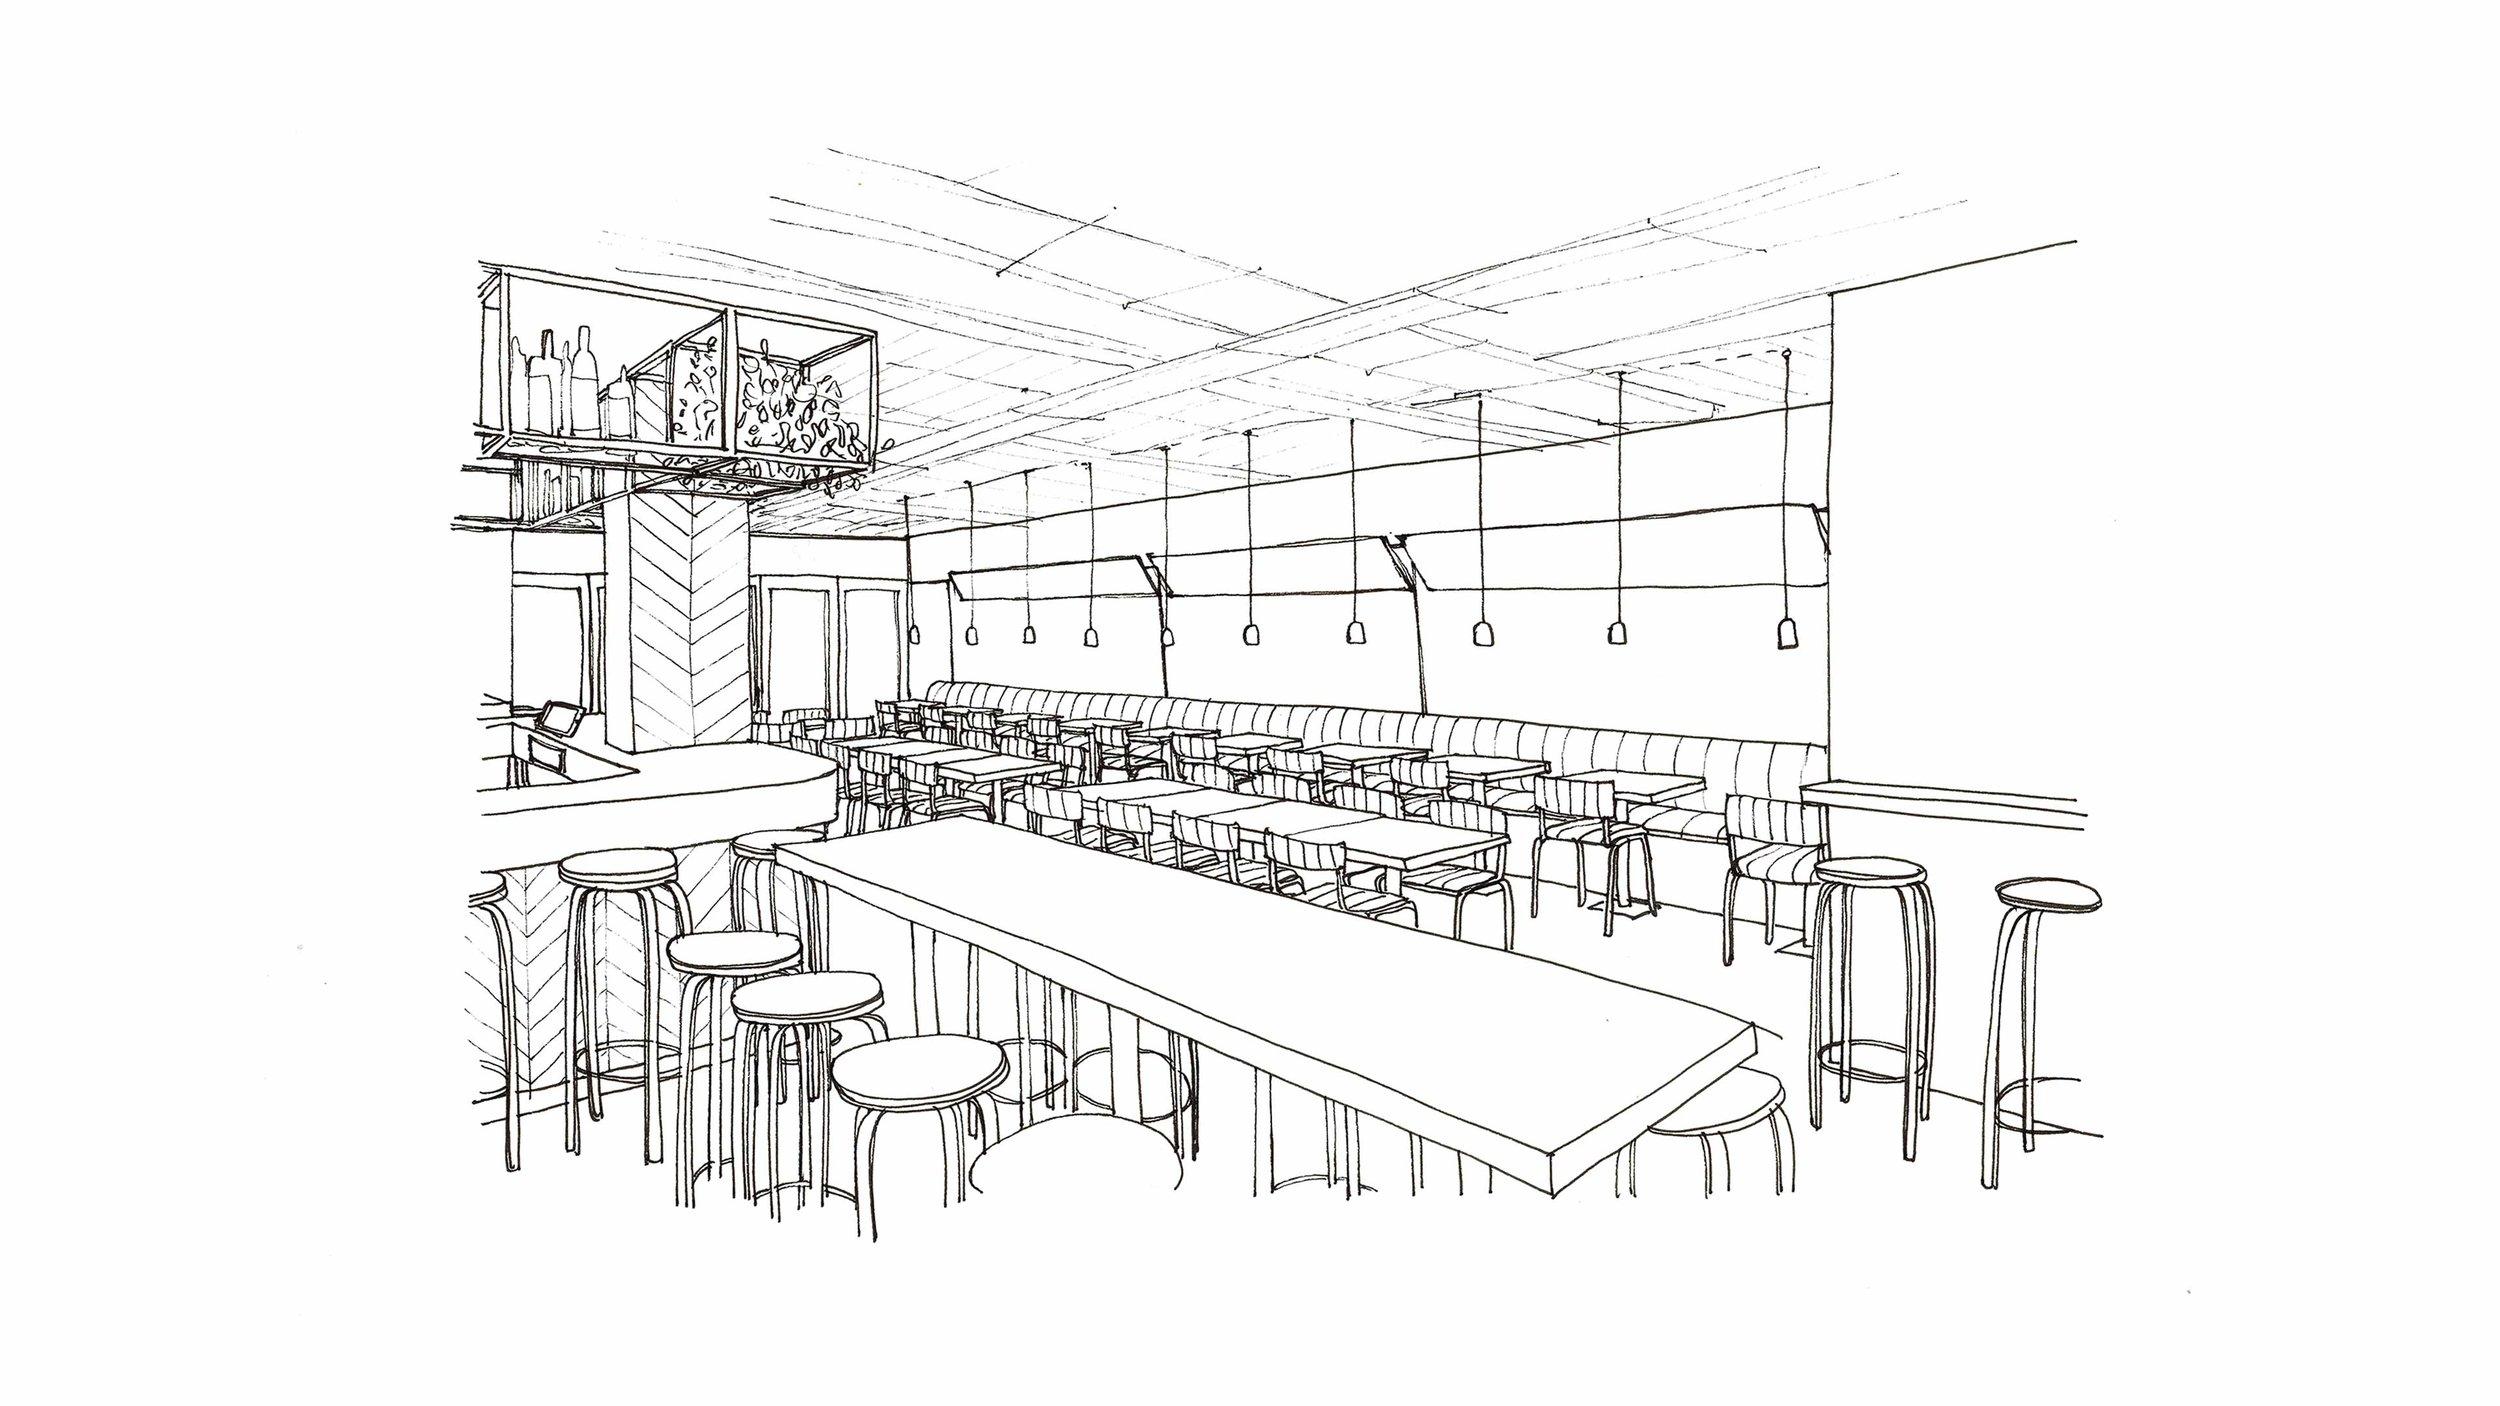 Pigsty Interior Sketch